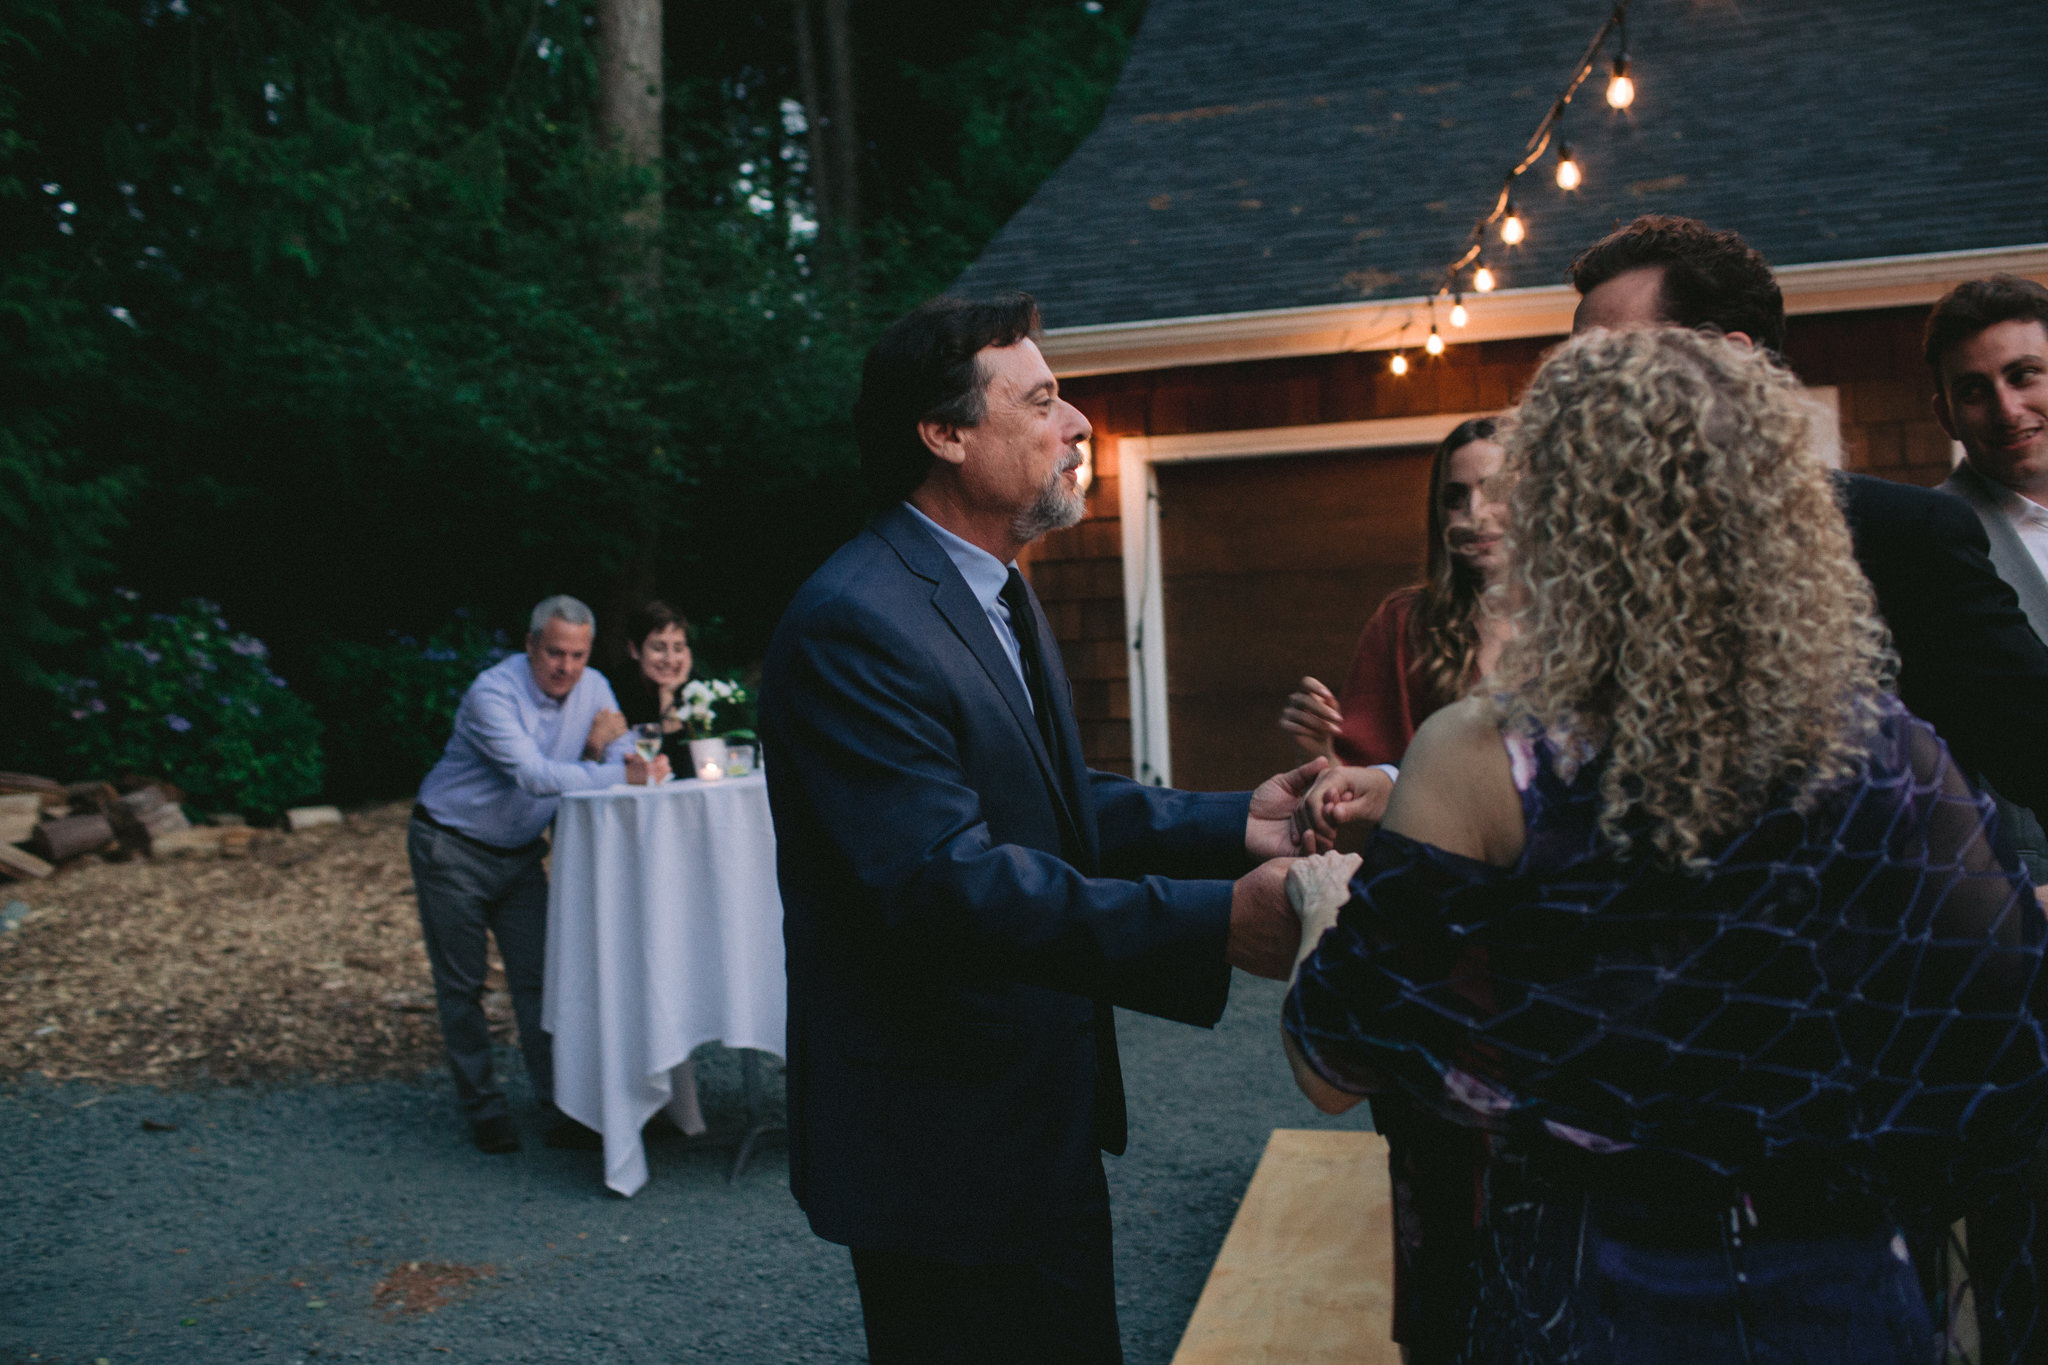 Backyard-Bainbridge-Island-Wedding-Alycia-Lovell-Photography-239.JPG